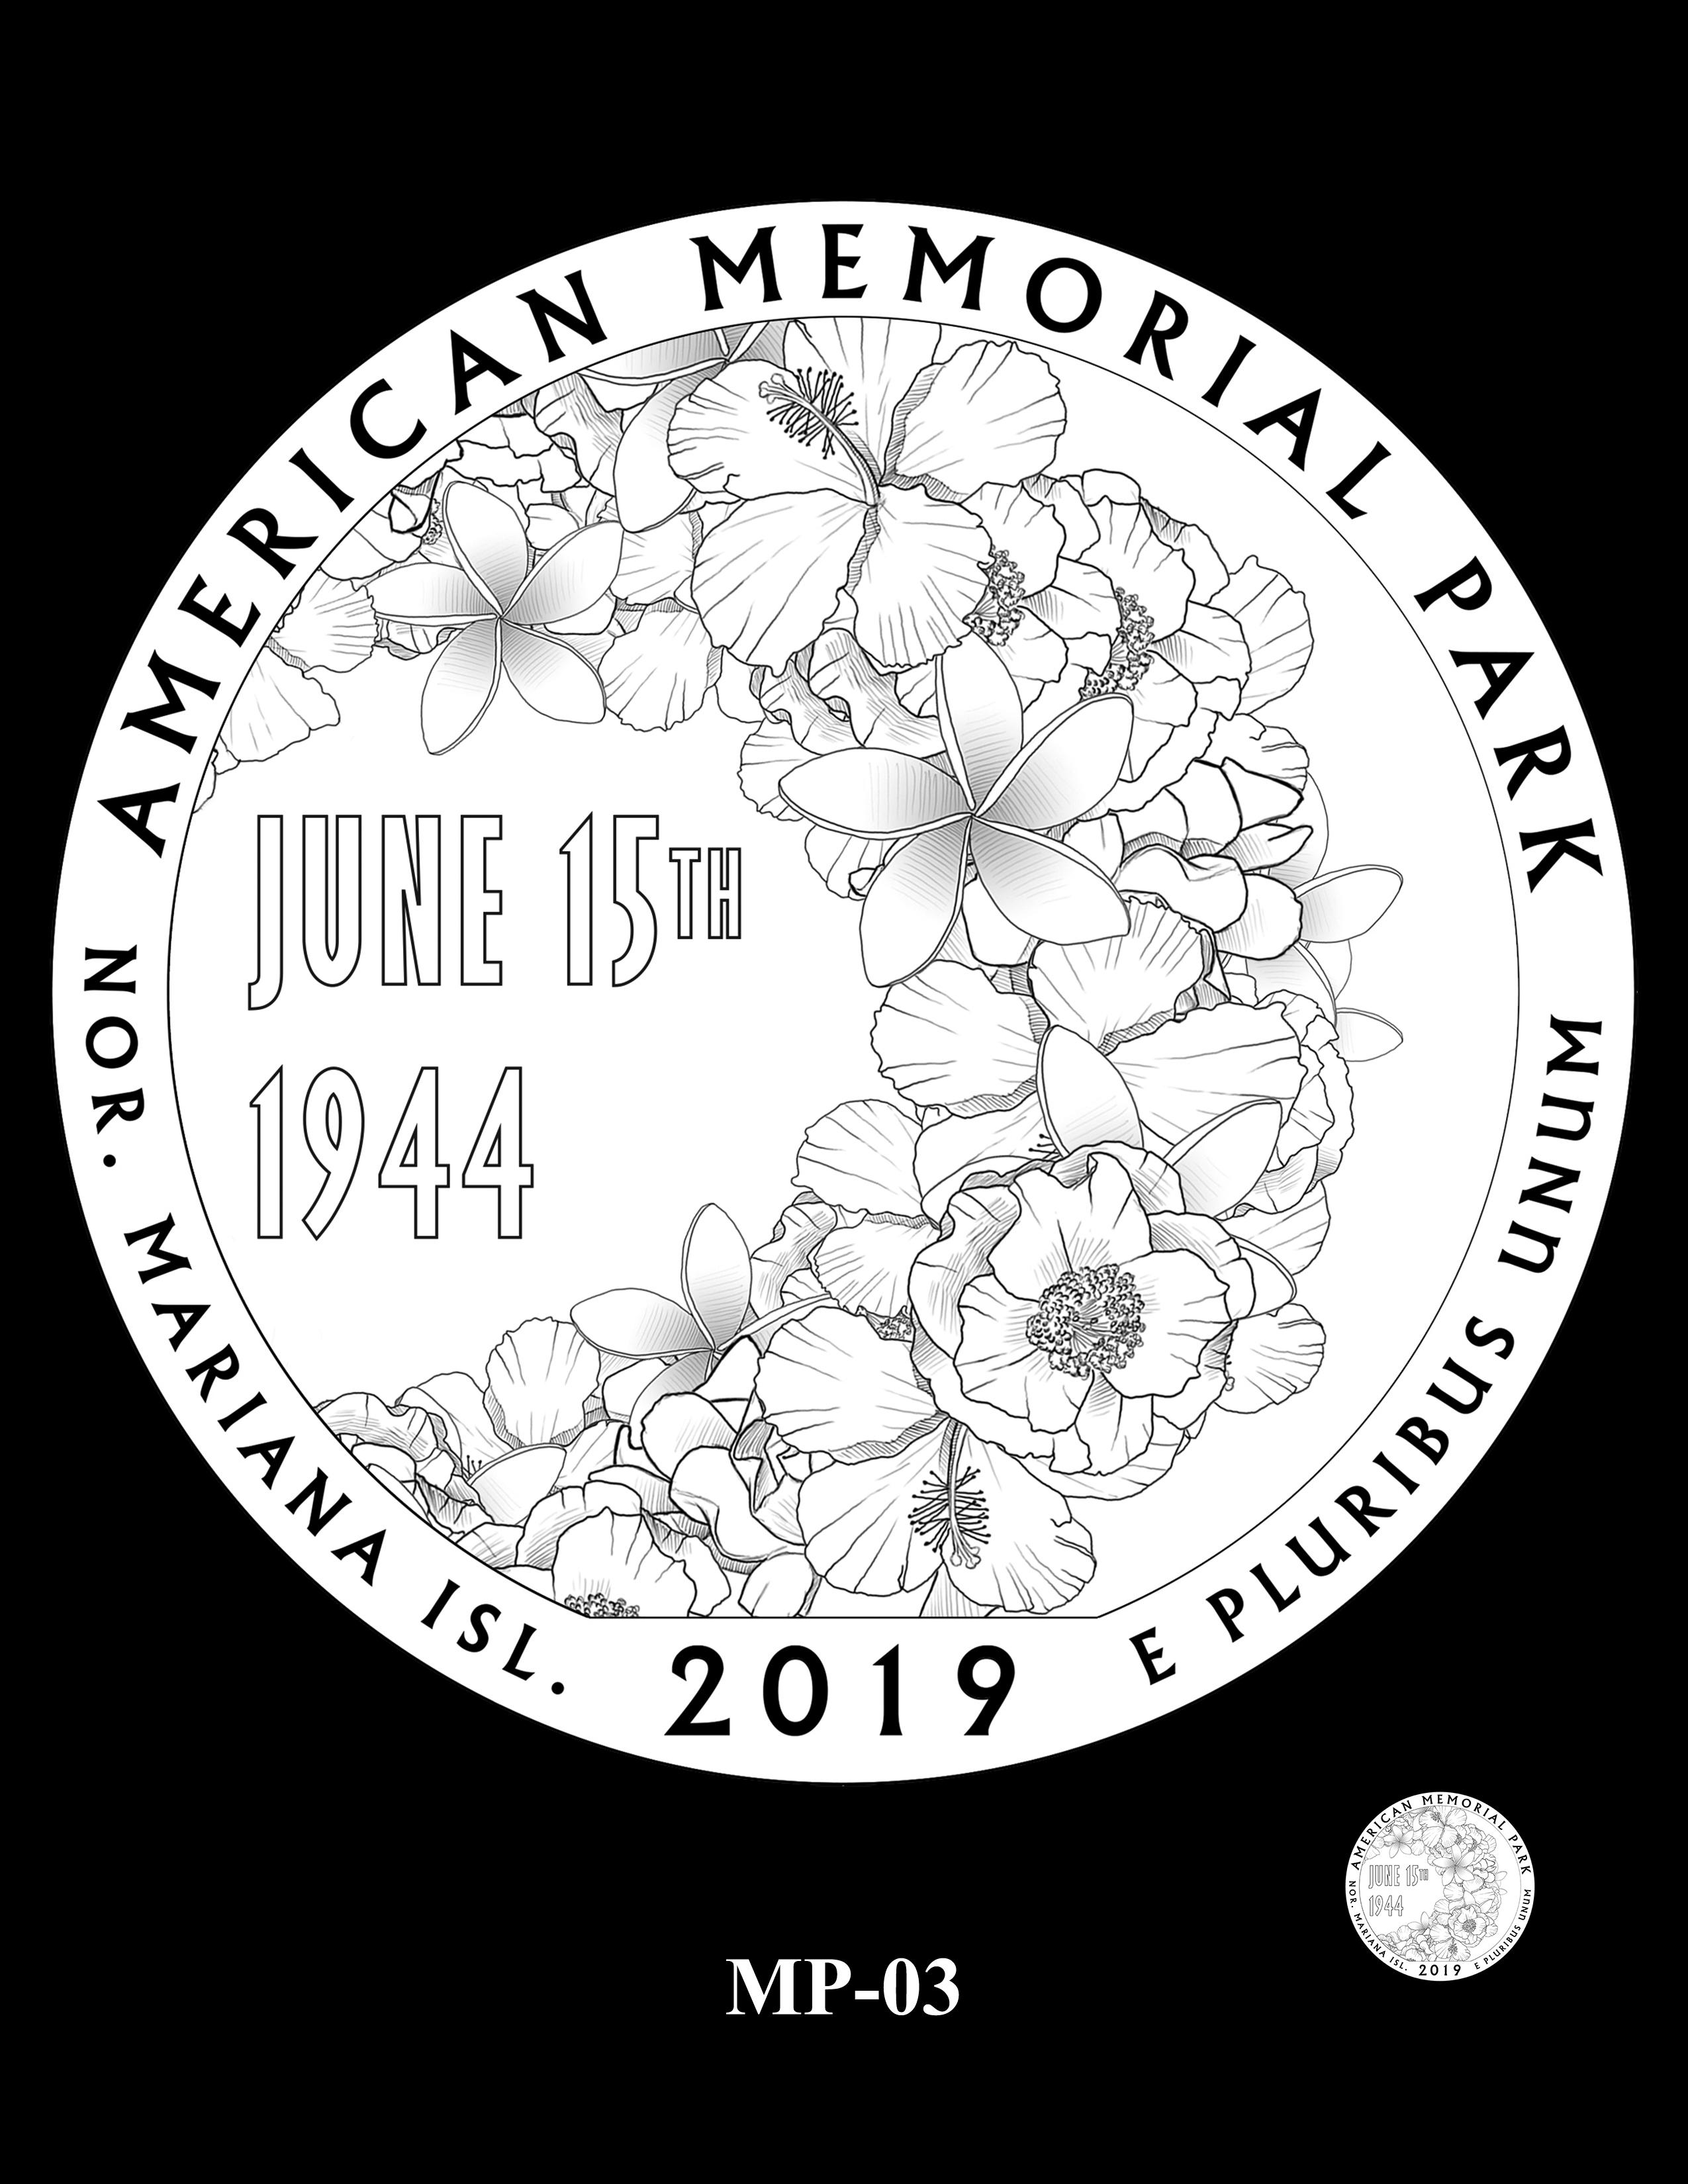 MP-03 -- 2019 America the Beautiful Quarters® Program